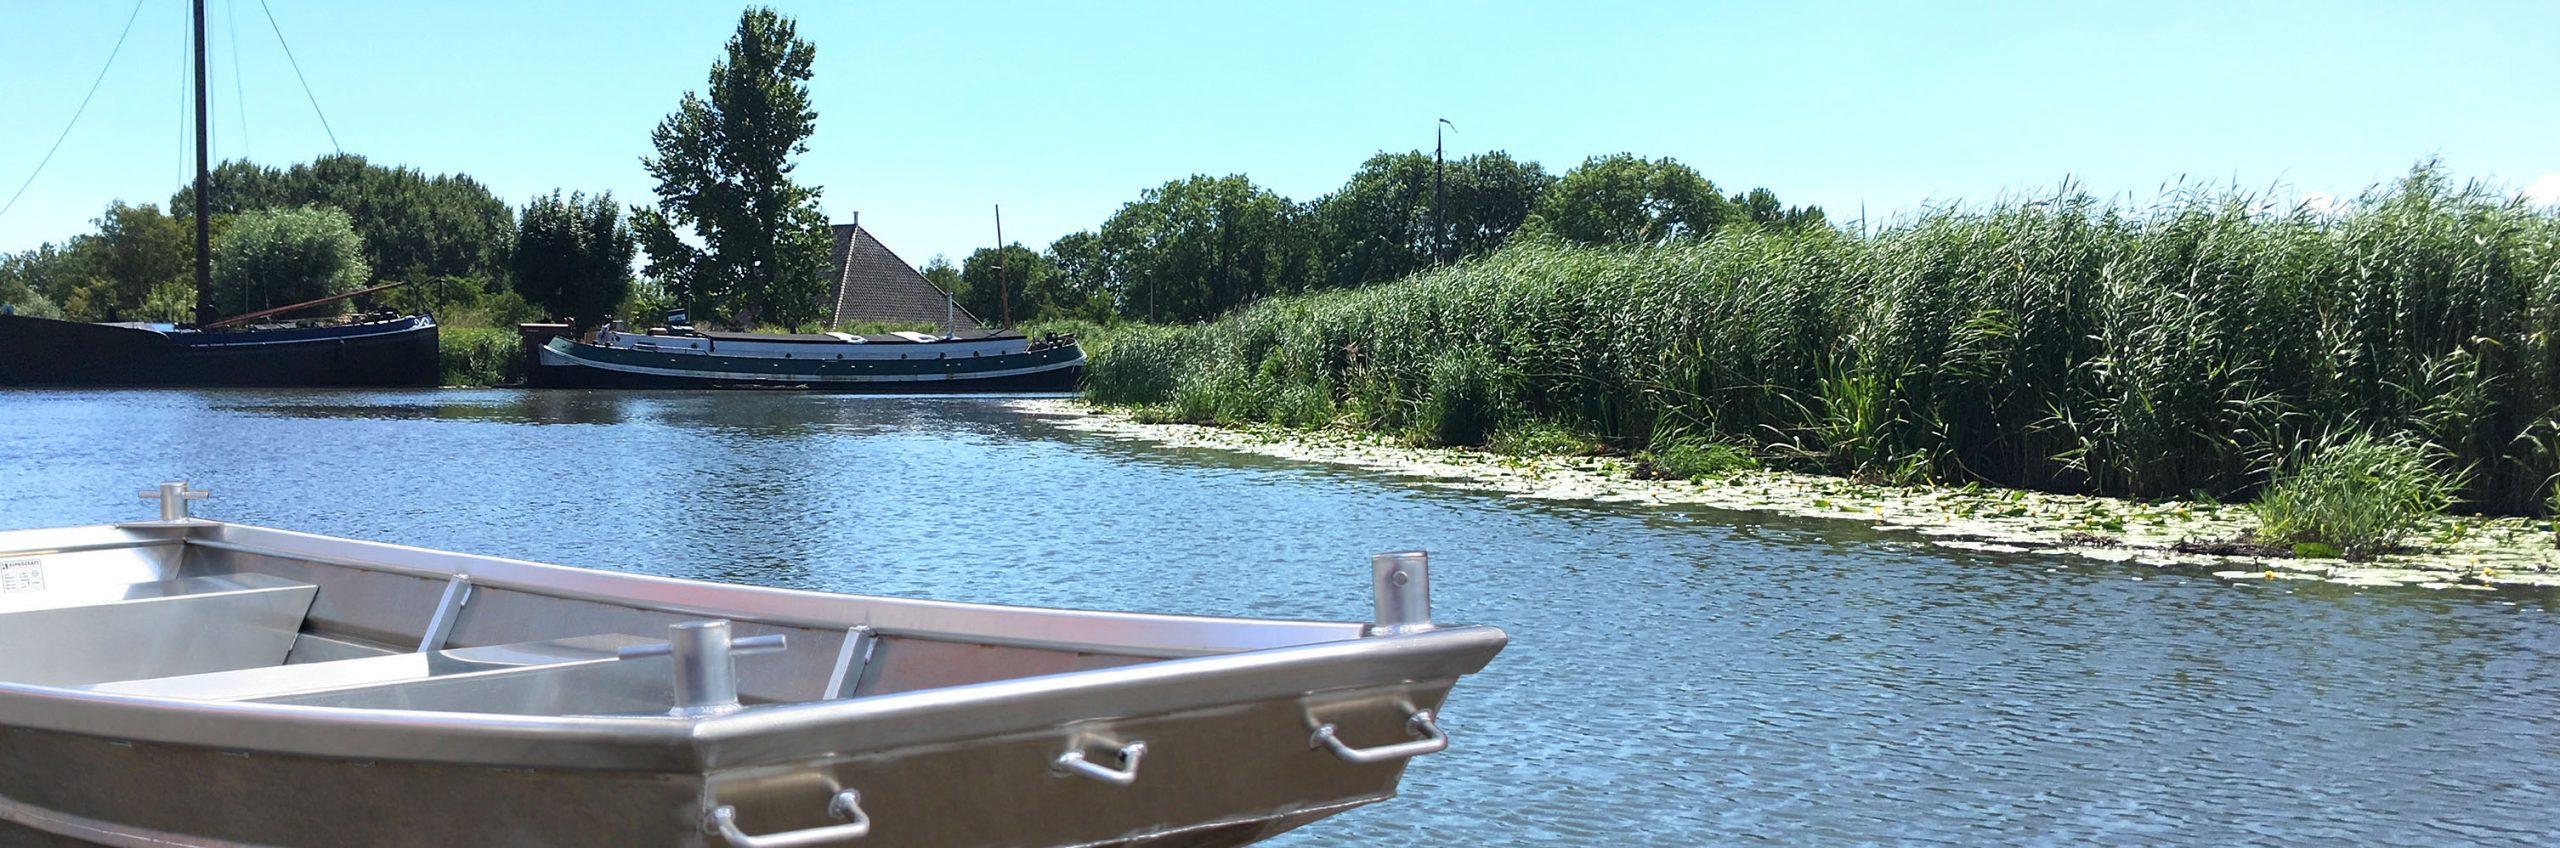 Products4ships aluminum motor boat (flat bottom) 1 (1)